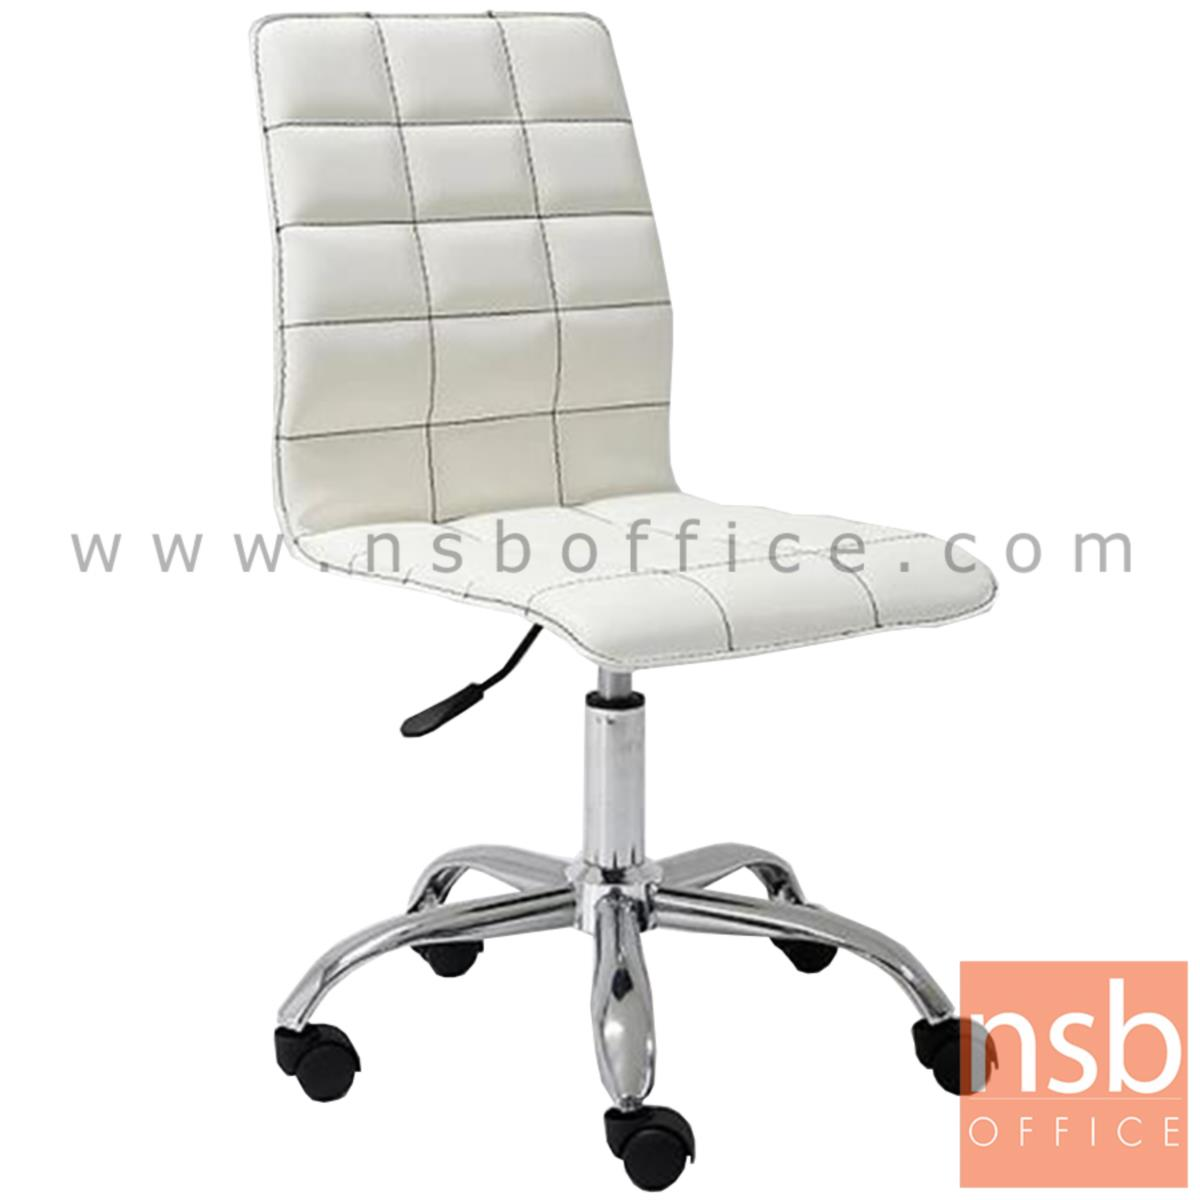 B03A450:เก้าอี้สำนักงาน  รุ่น Marcia (มาร์เชอ)  โช๊คแก๊ส ขาเหล็กชุบโครเมี่ยม